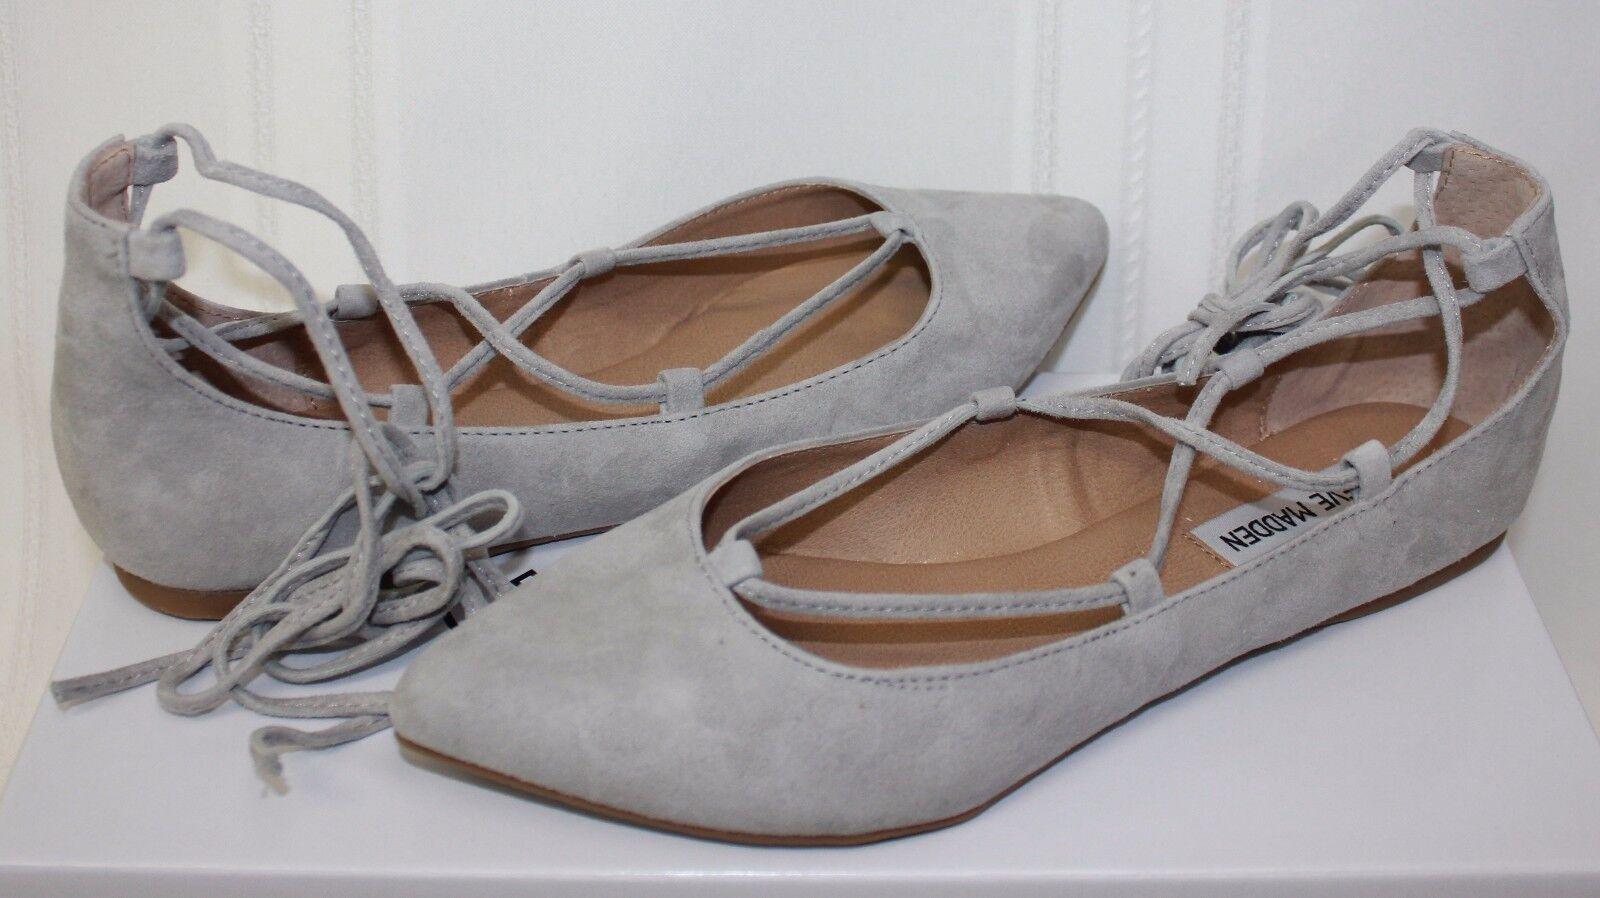 Steve Madden Women's Eleanorr Eleanor ballet flats Light Grey Suede New With Box